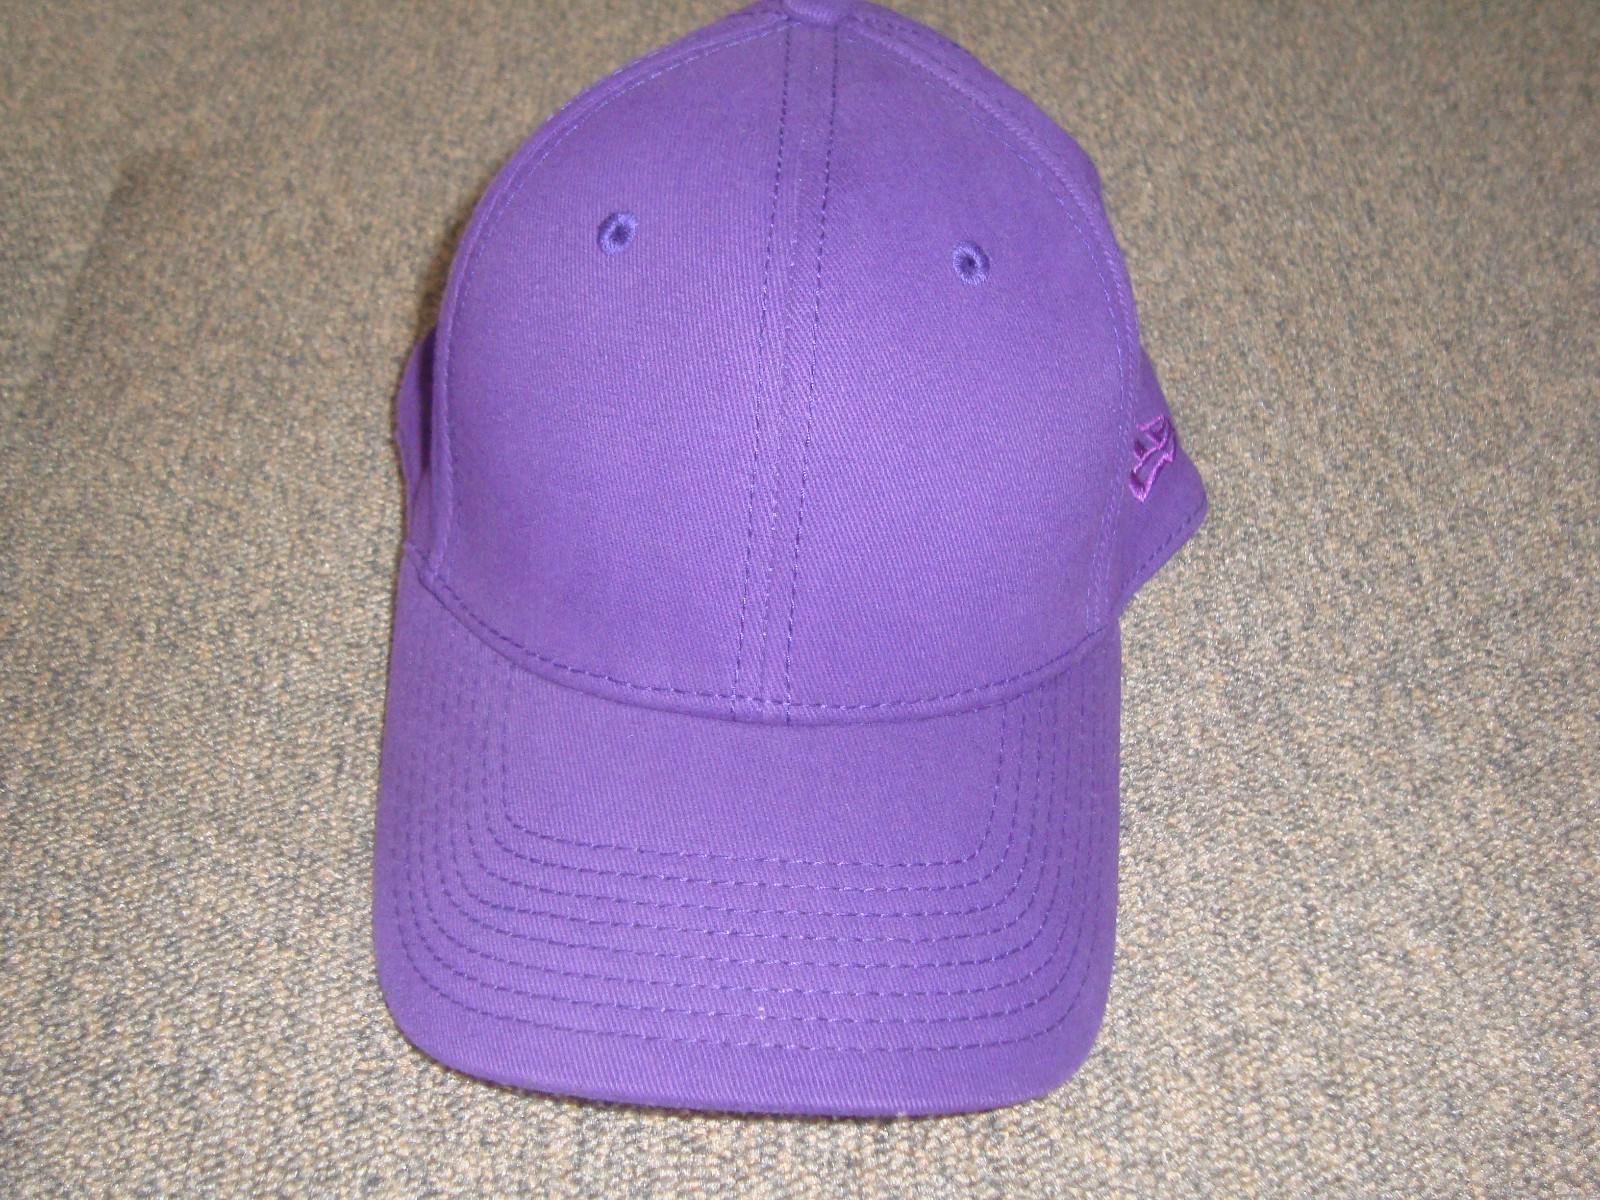 New Era Cap Kappe Größe S / M